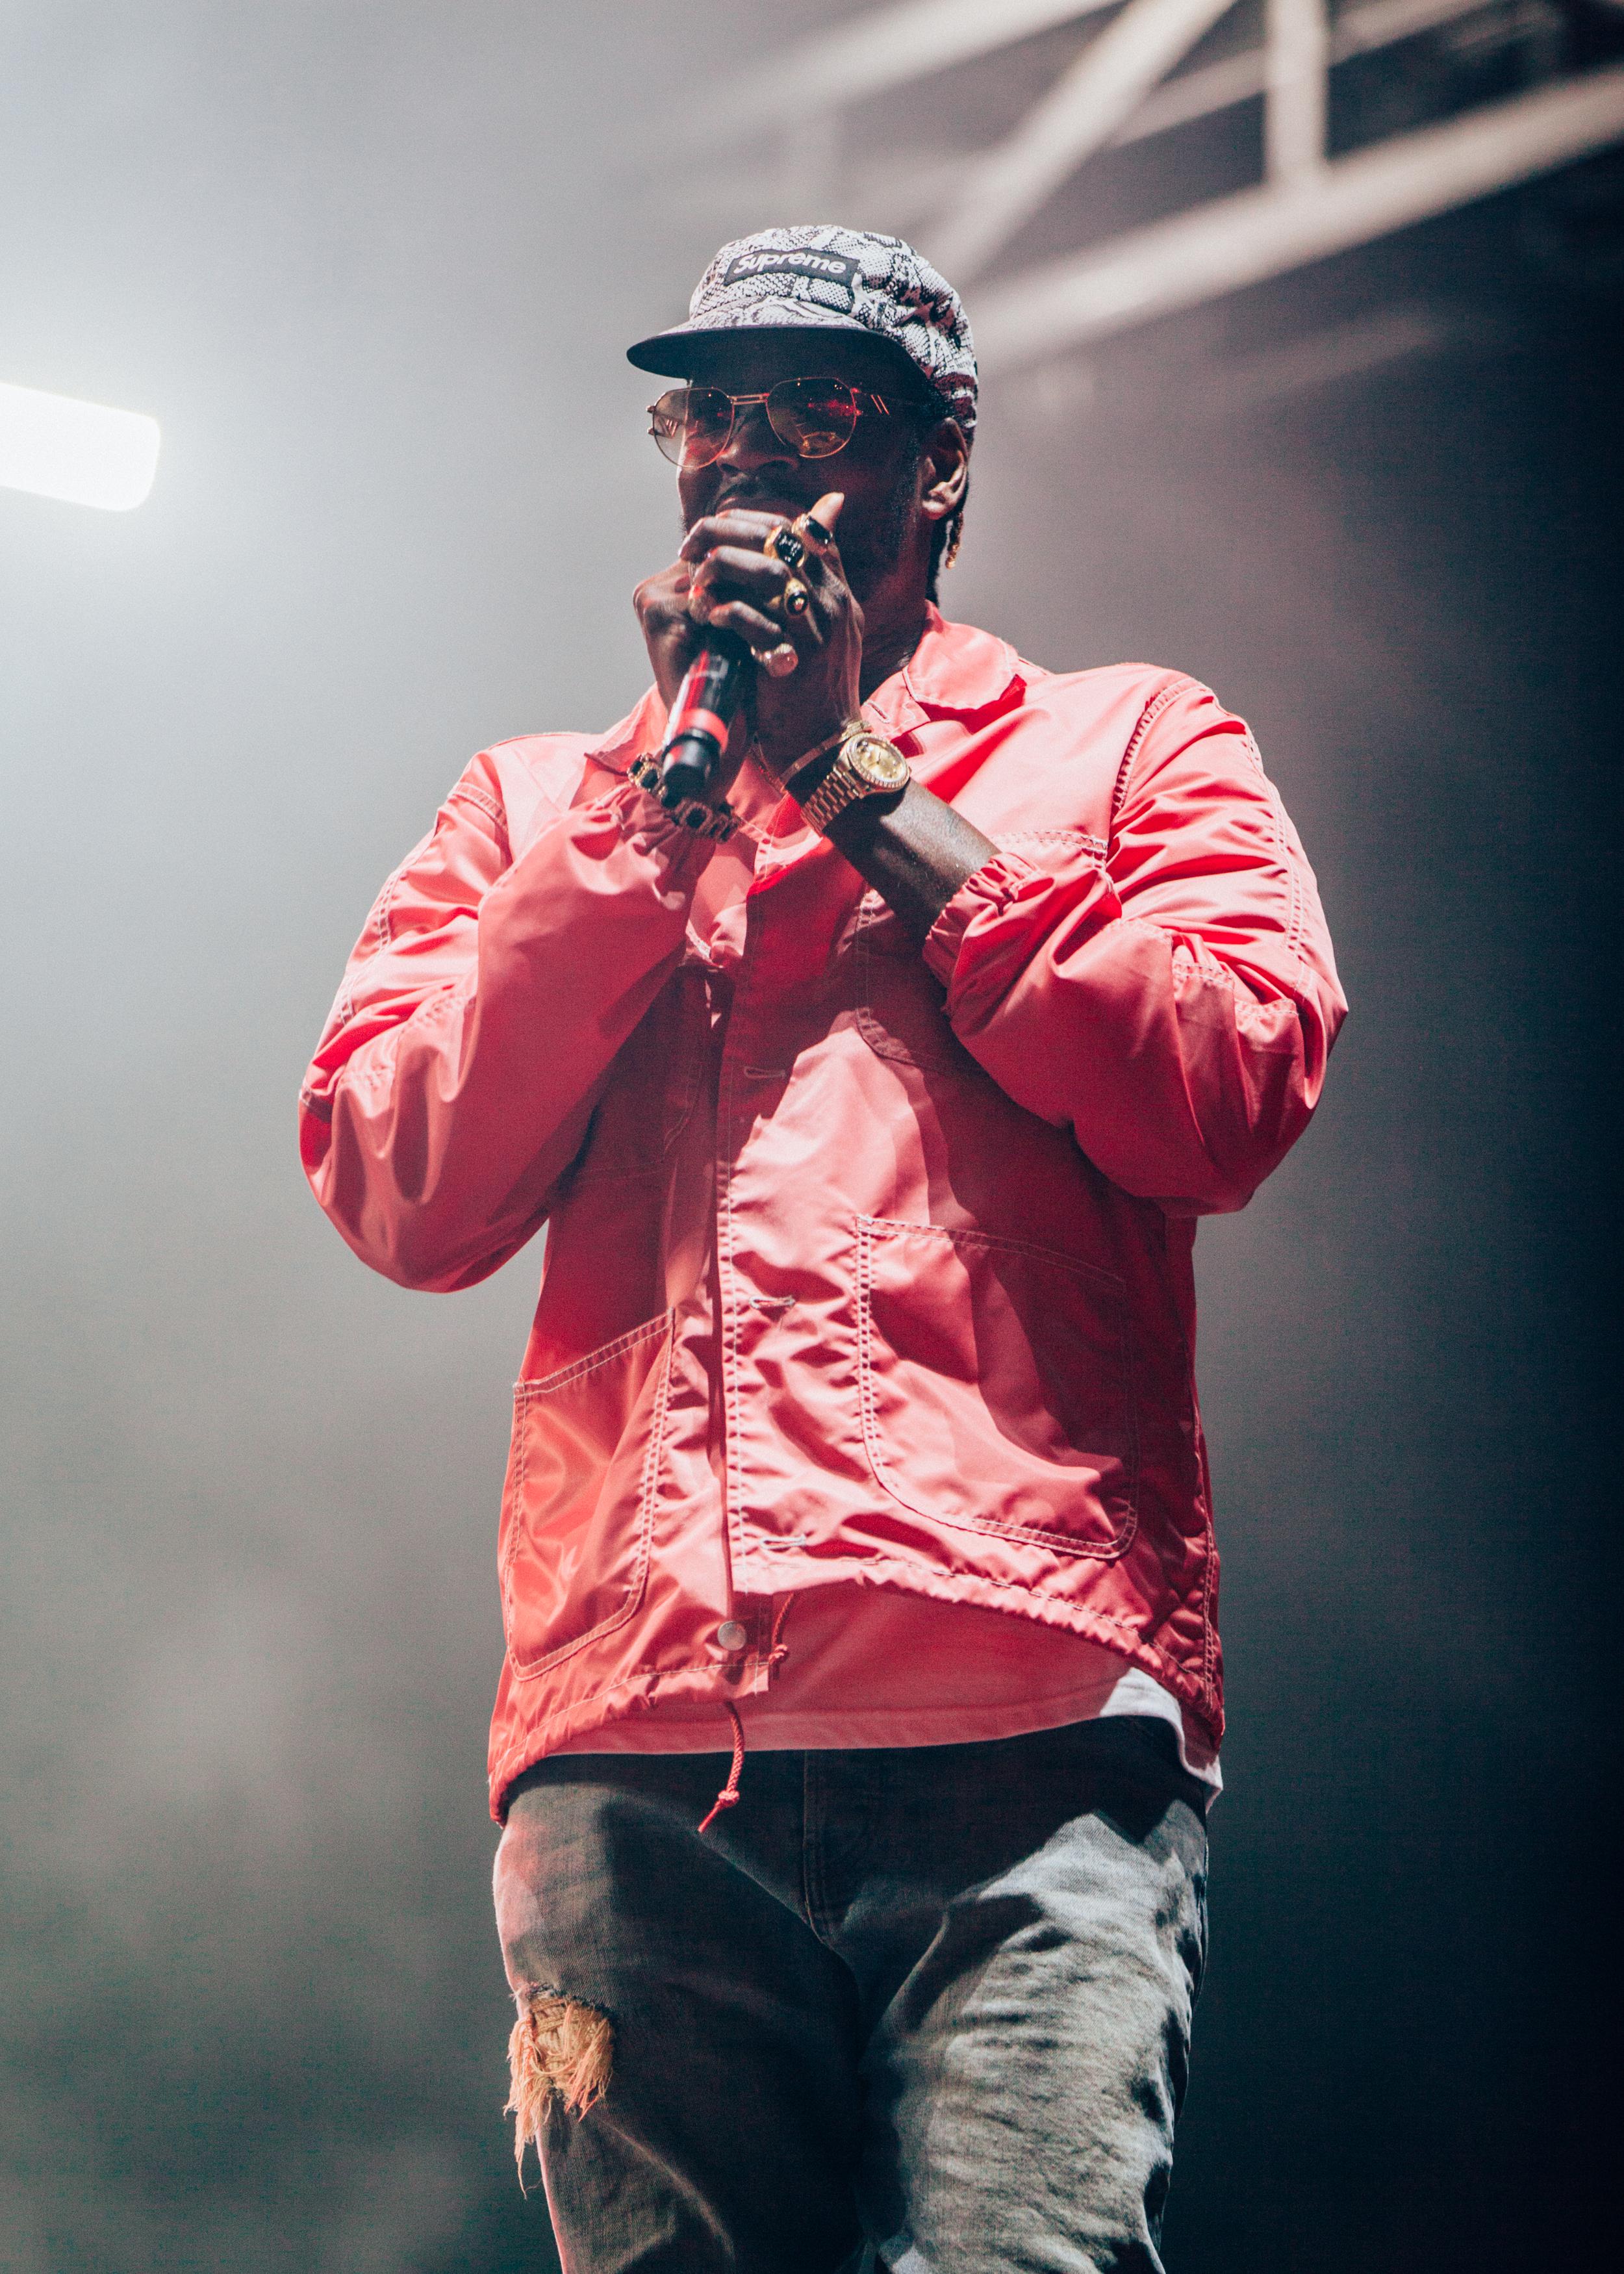 ColleGrove (2 Chainz x Lil Wayne)